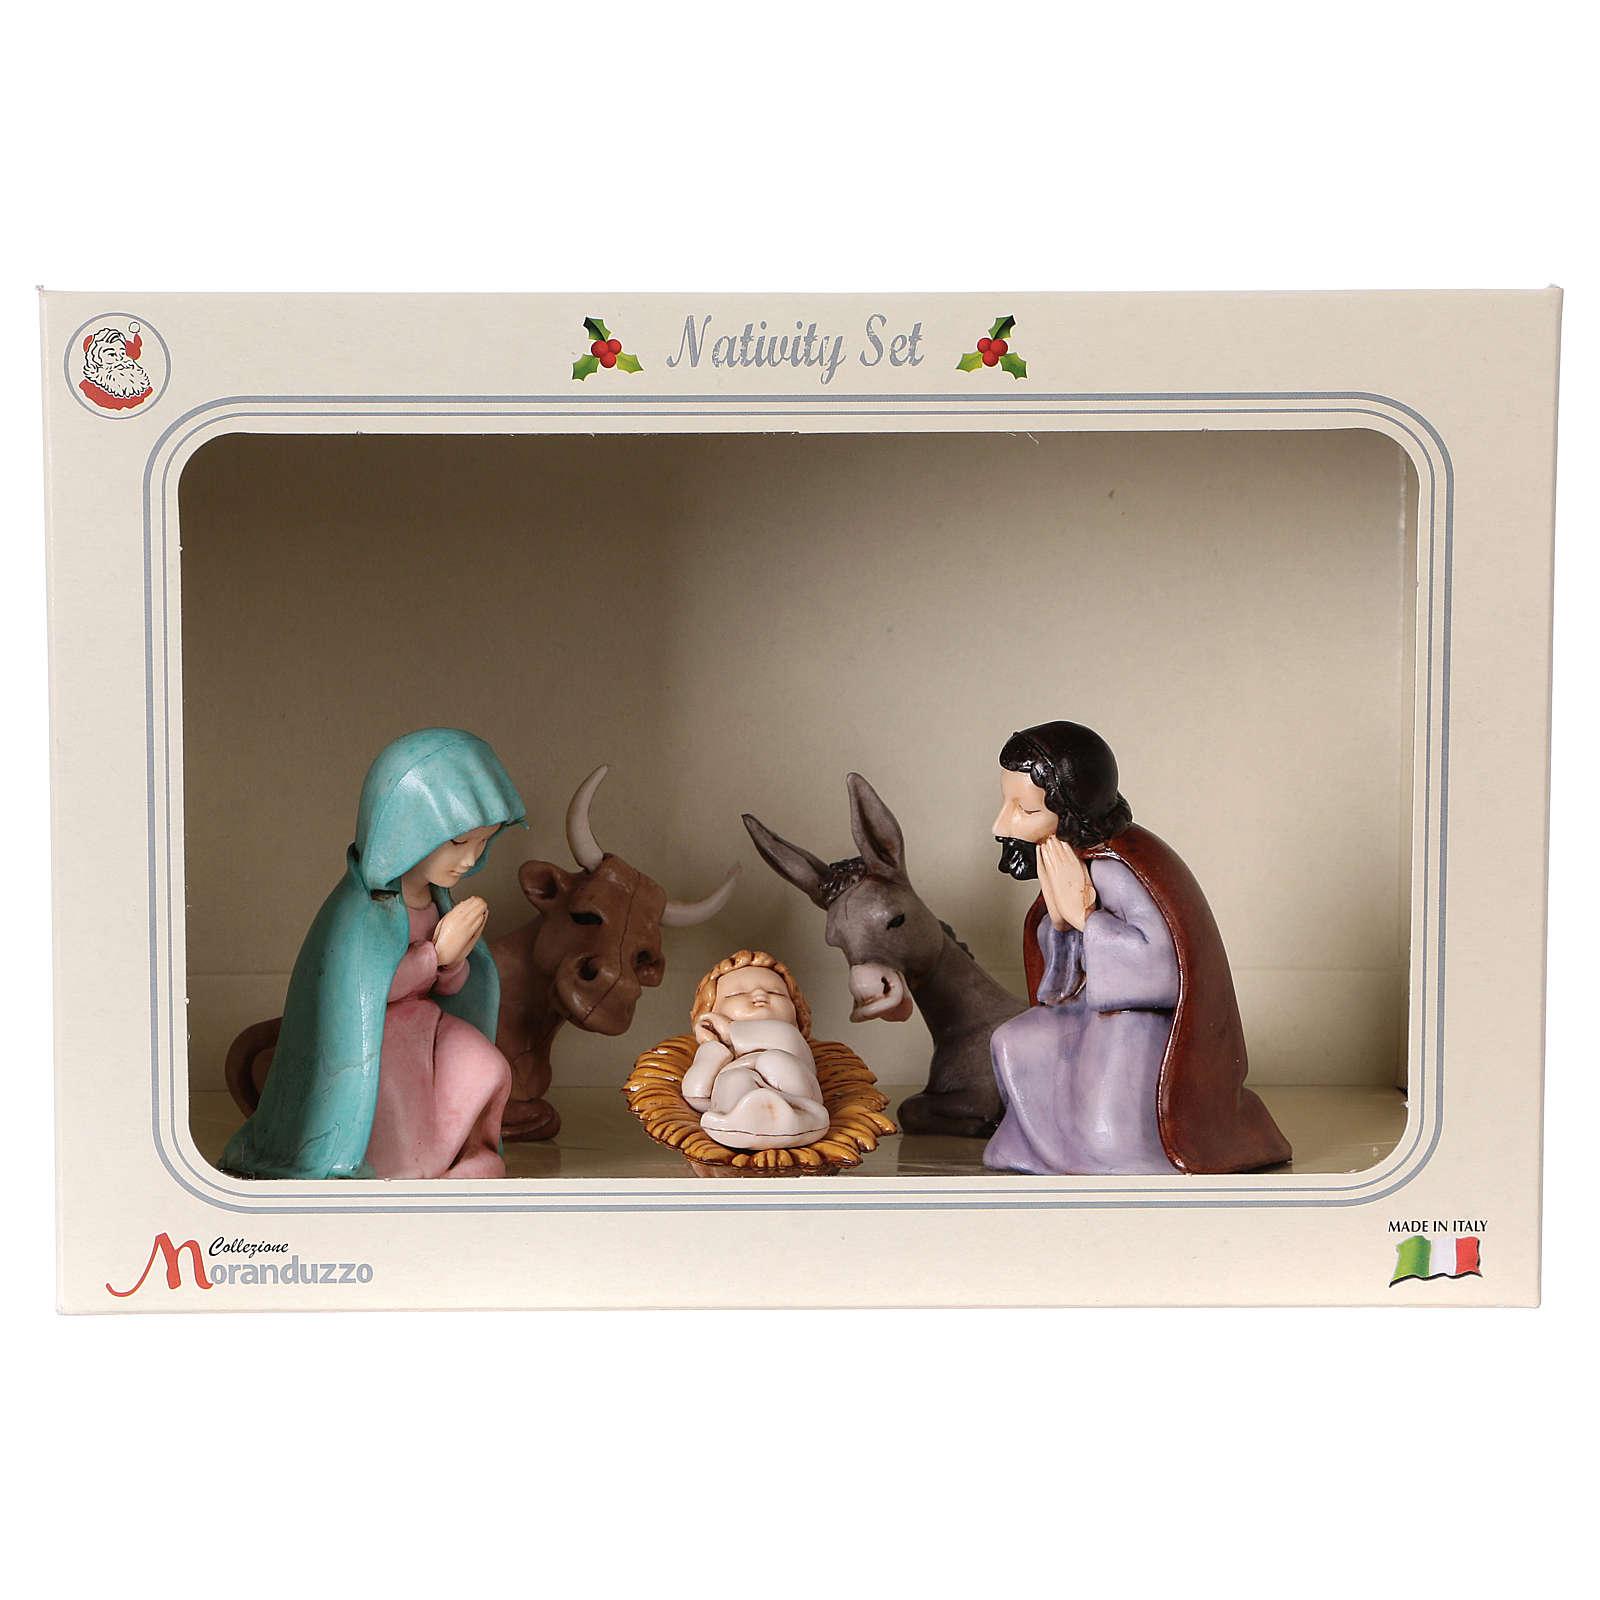 PVC Holy Family for Moranduzzo Nativity scene 7 cm 5 pieces, Children's Line 4